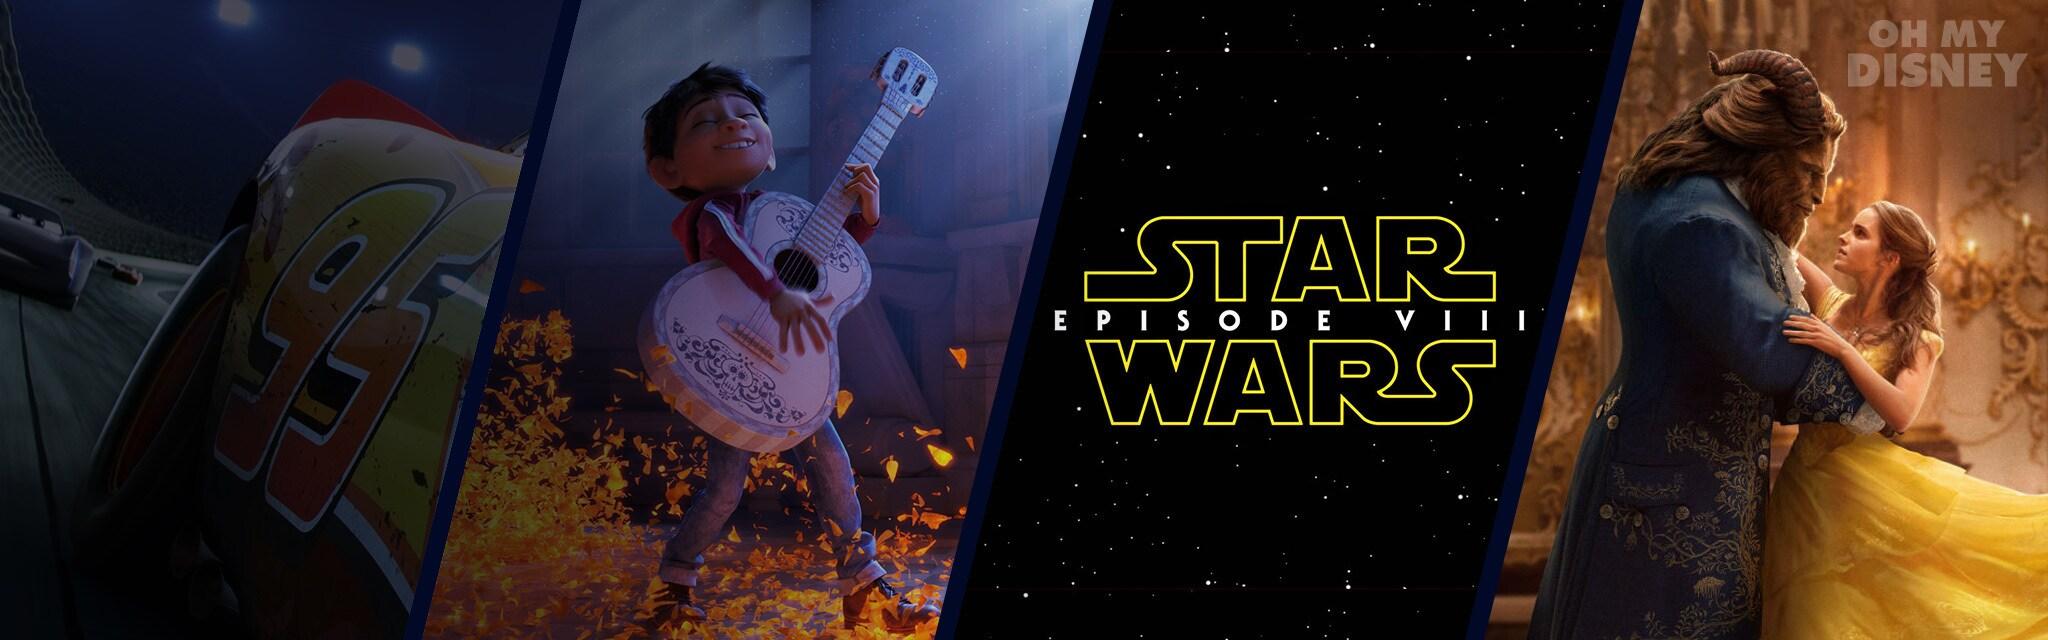 Walt Disney Studios - 2017 Movie Slate - Hero